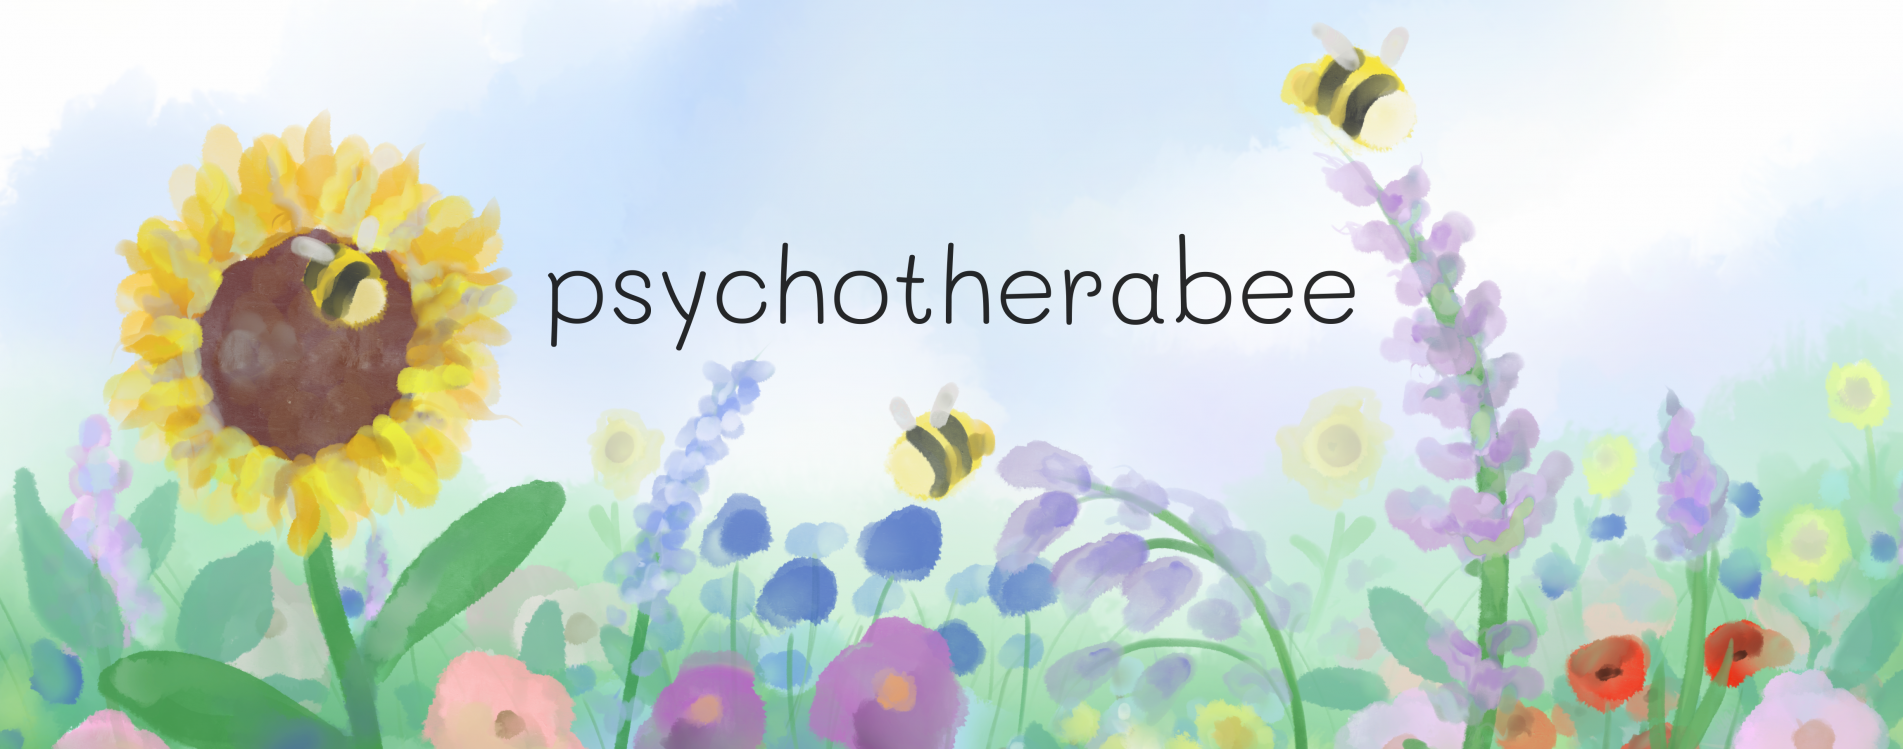 psychotherabee